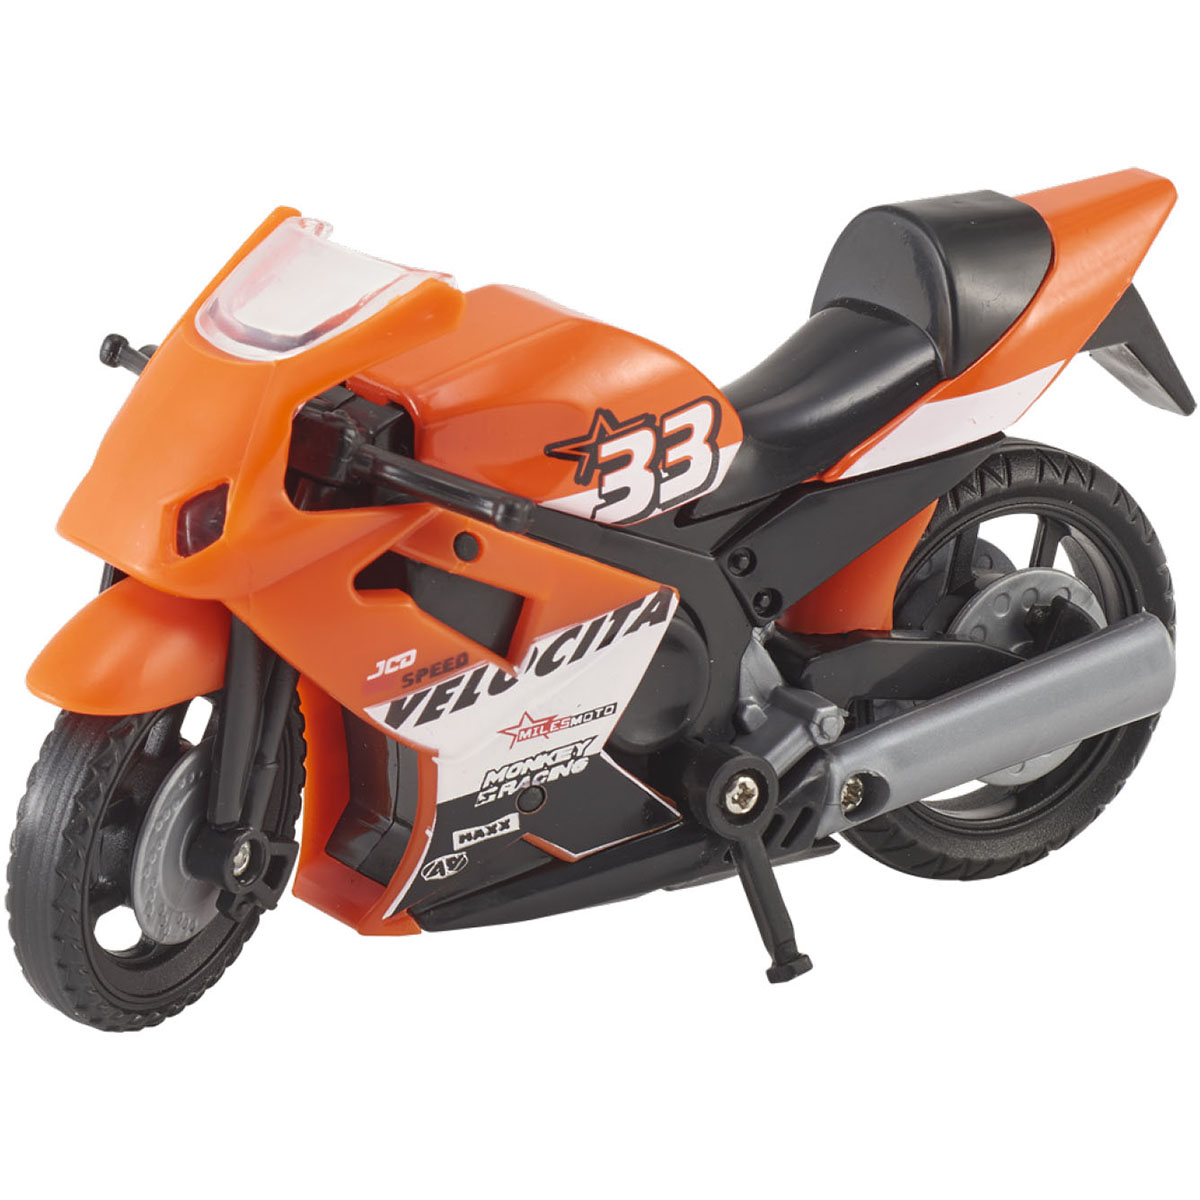 Motocicleta Teamsterz Speed Bike, Rosu imagine